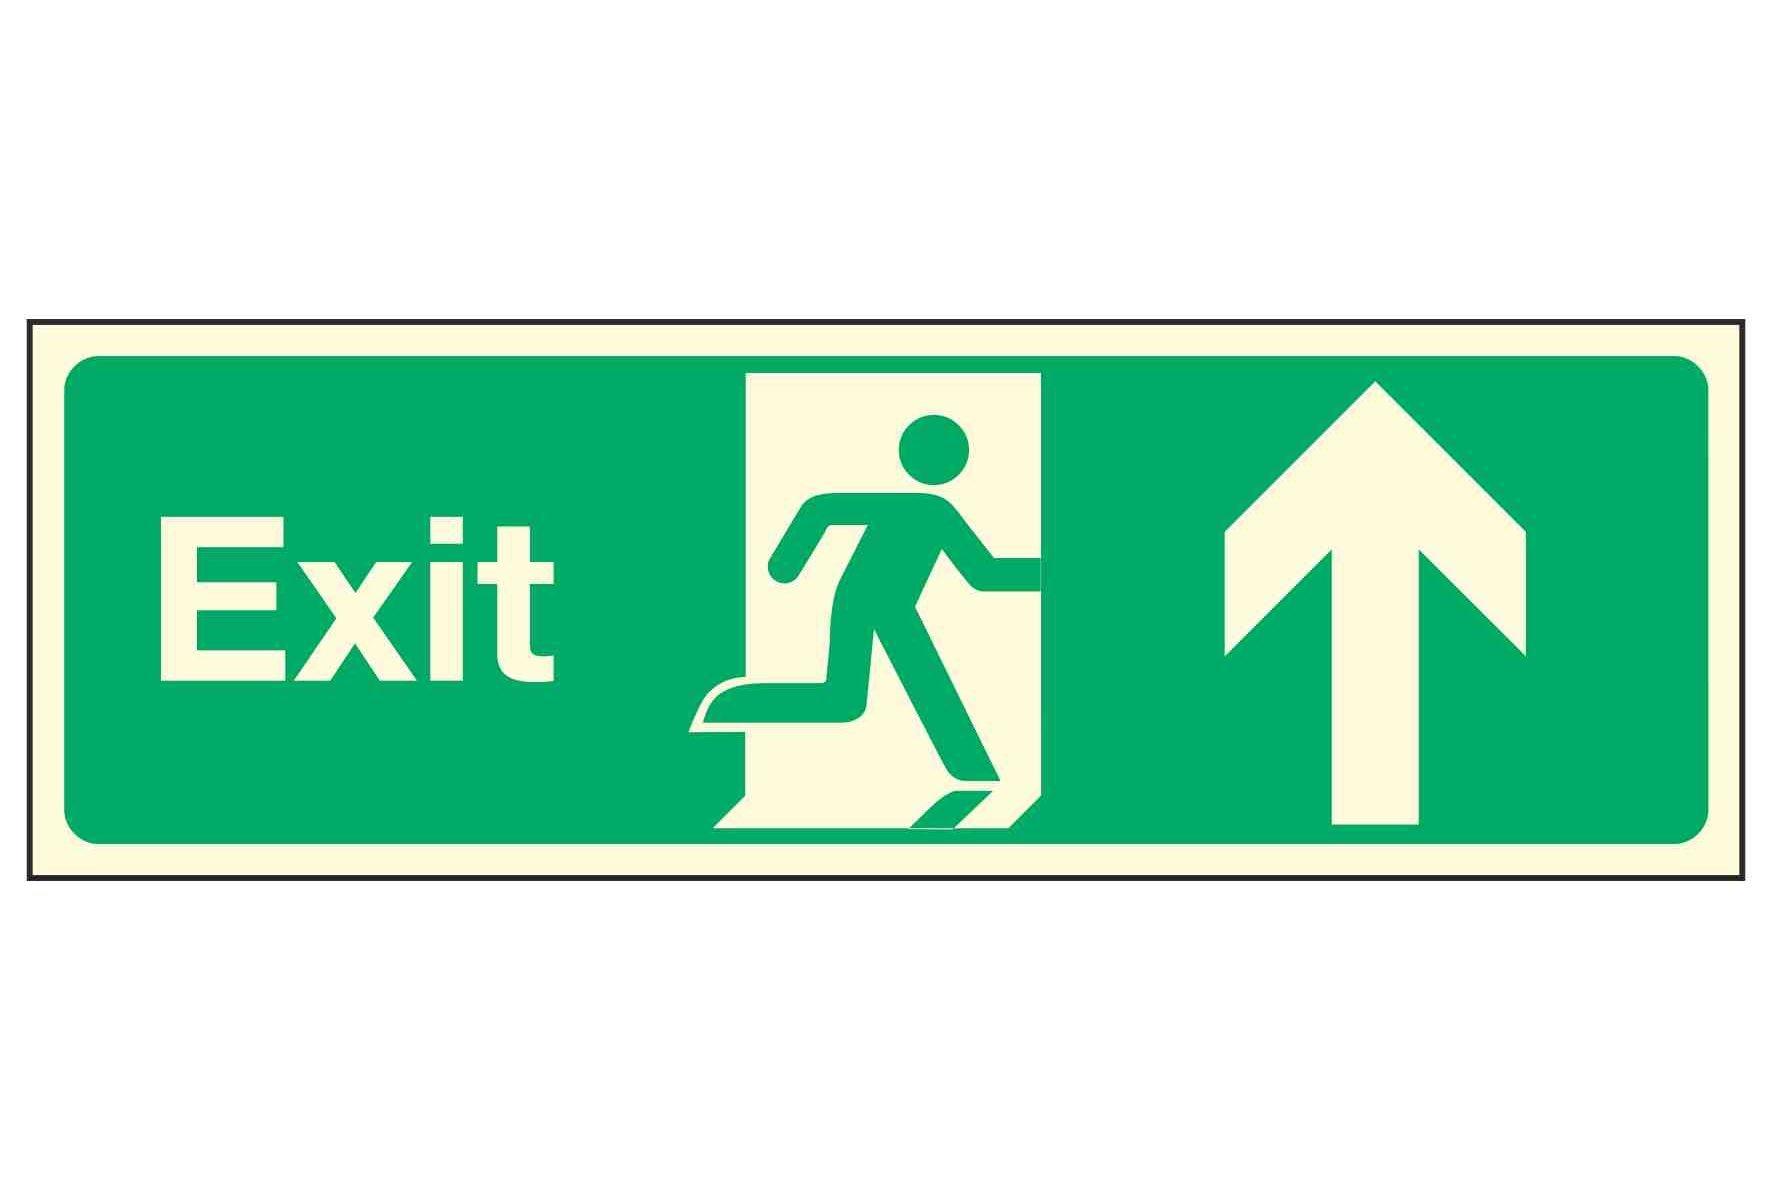 Exit / Arrow Up PL